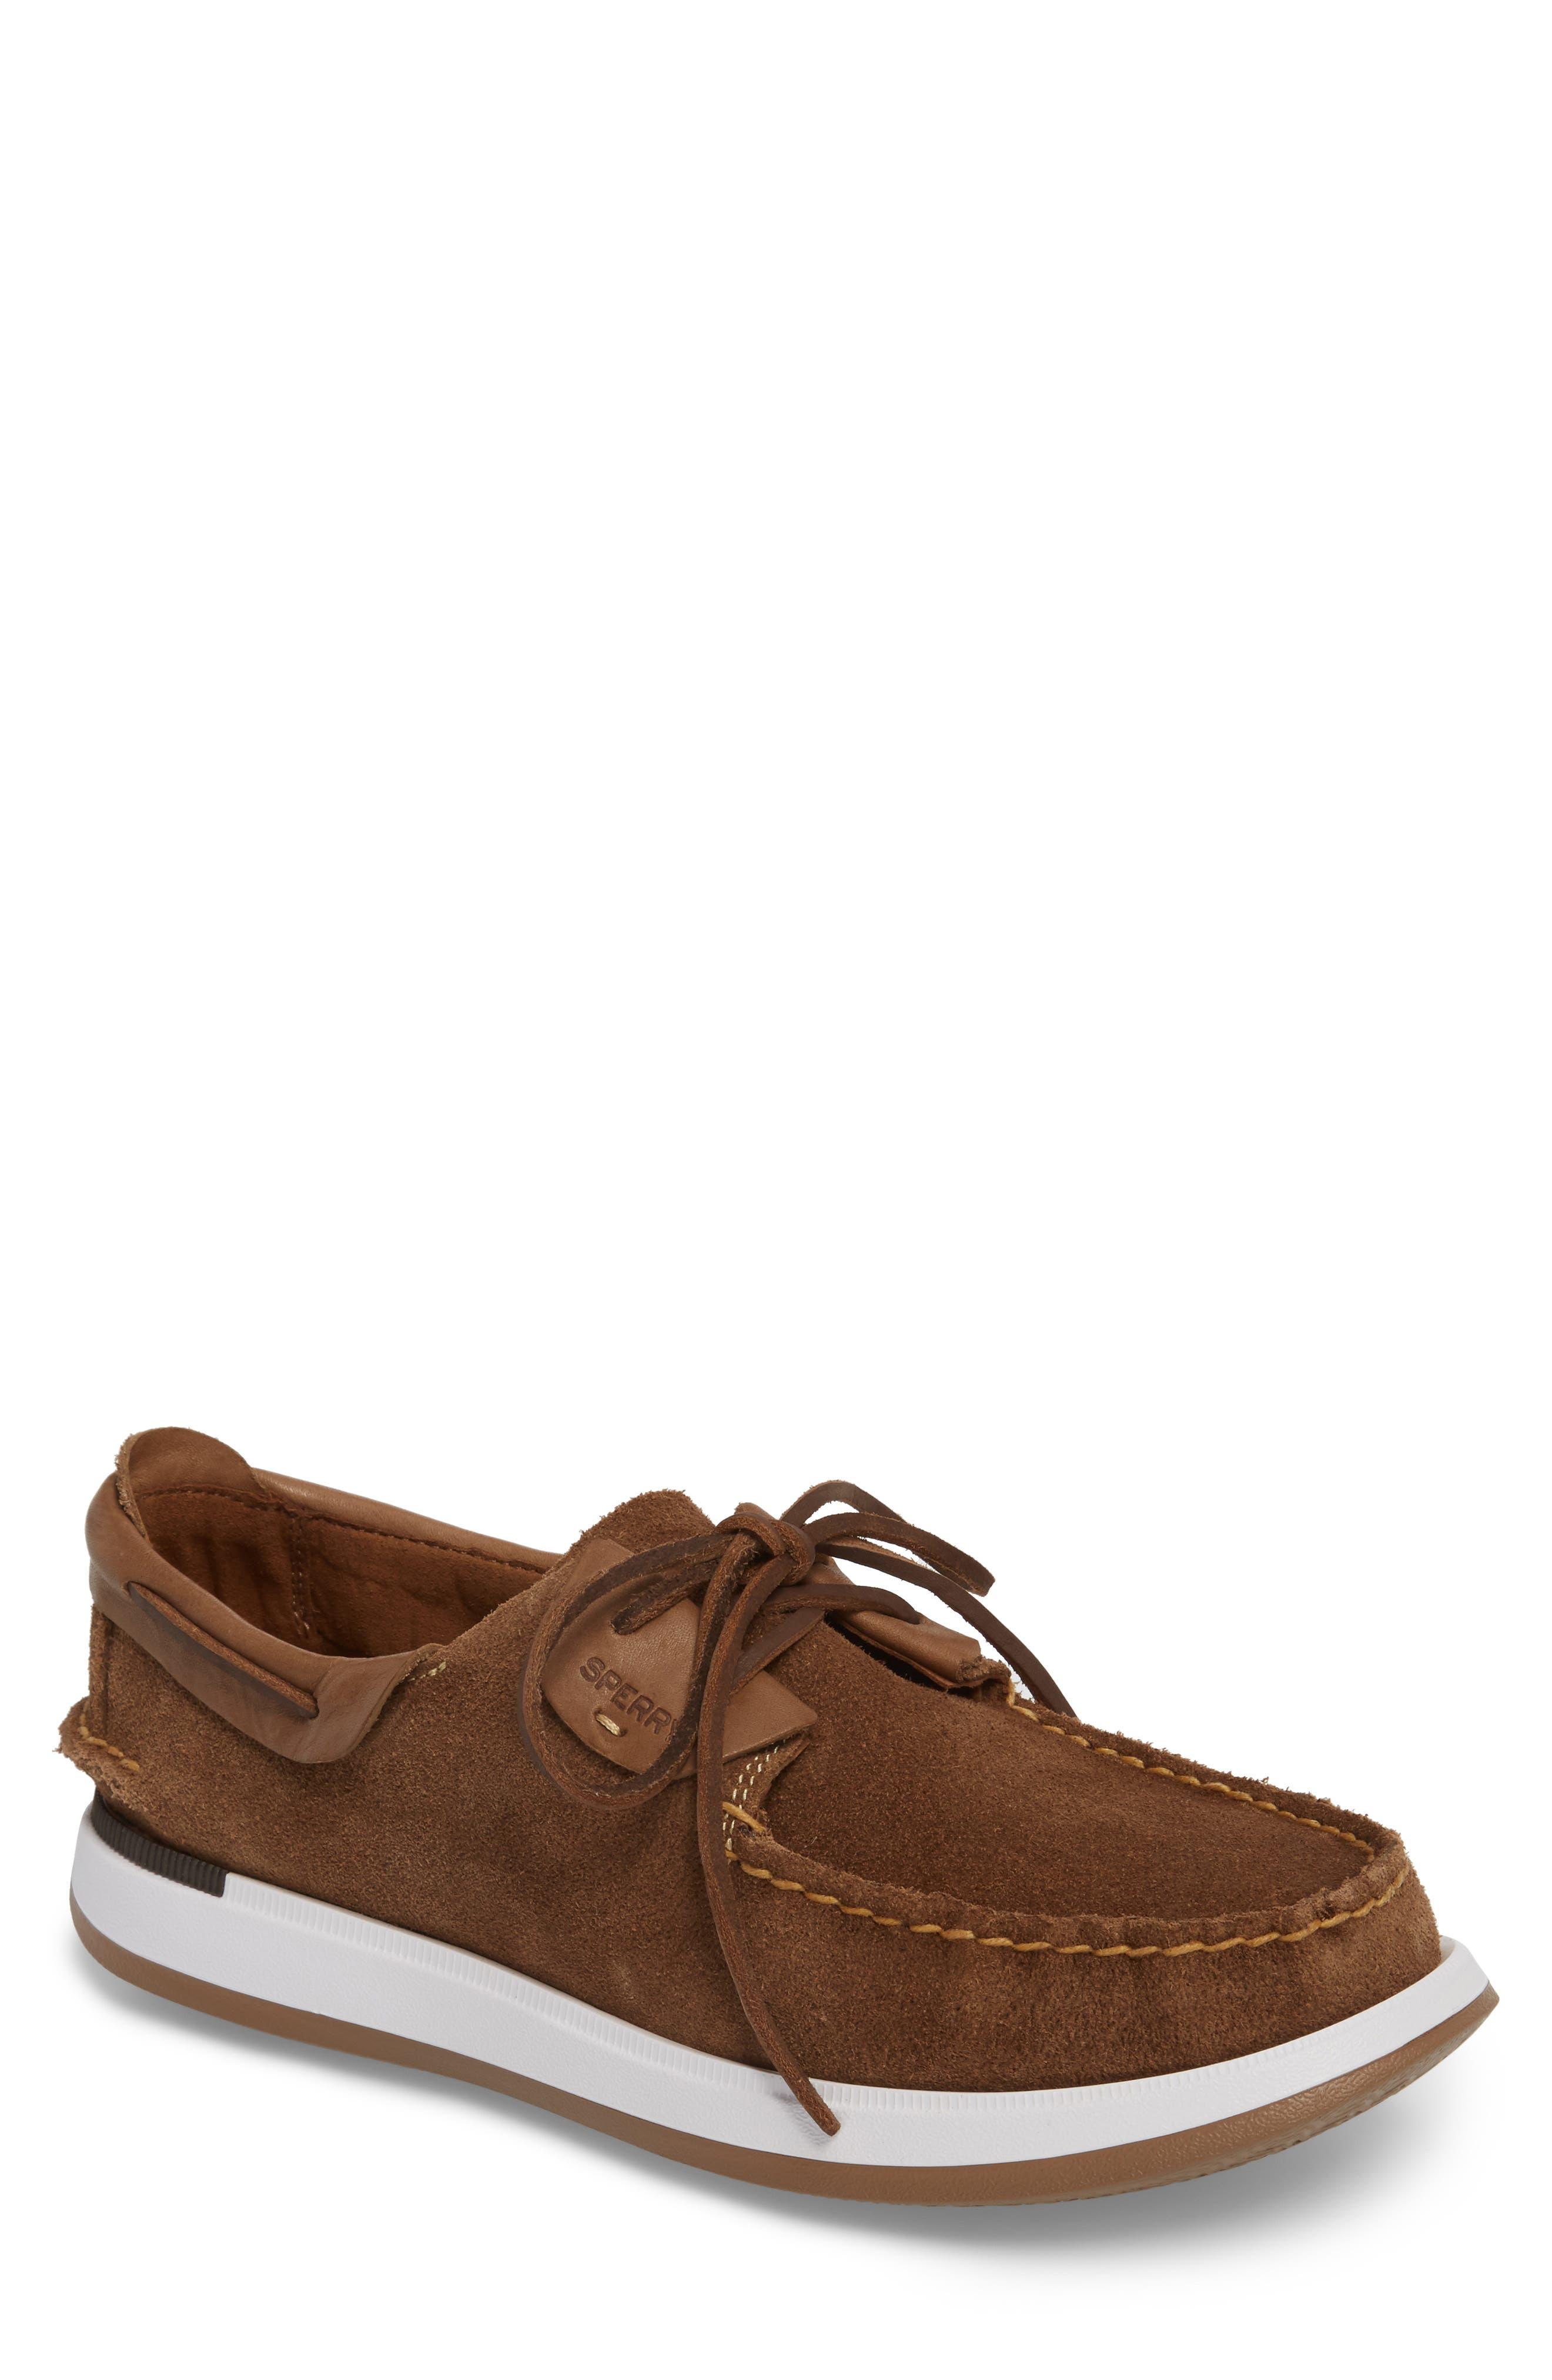 Caspian Boat Shoe,                             Main thumbnail 1, color,                             Tan Leather/ Suede